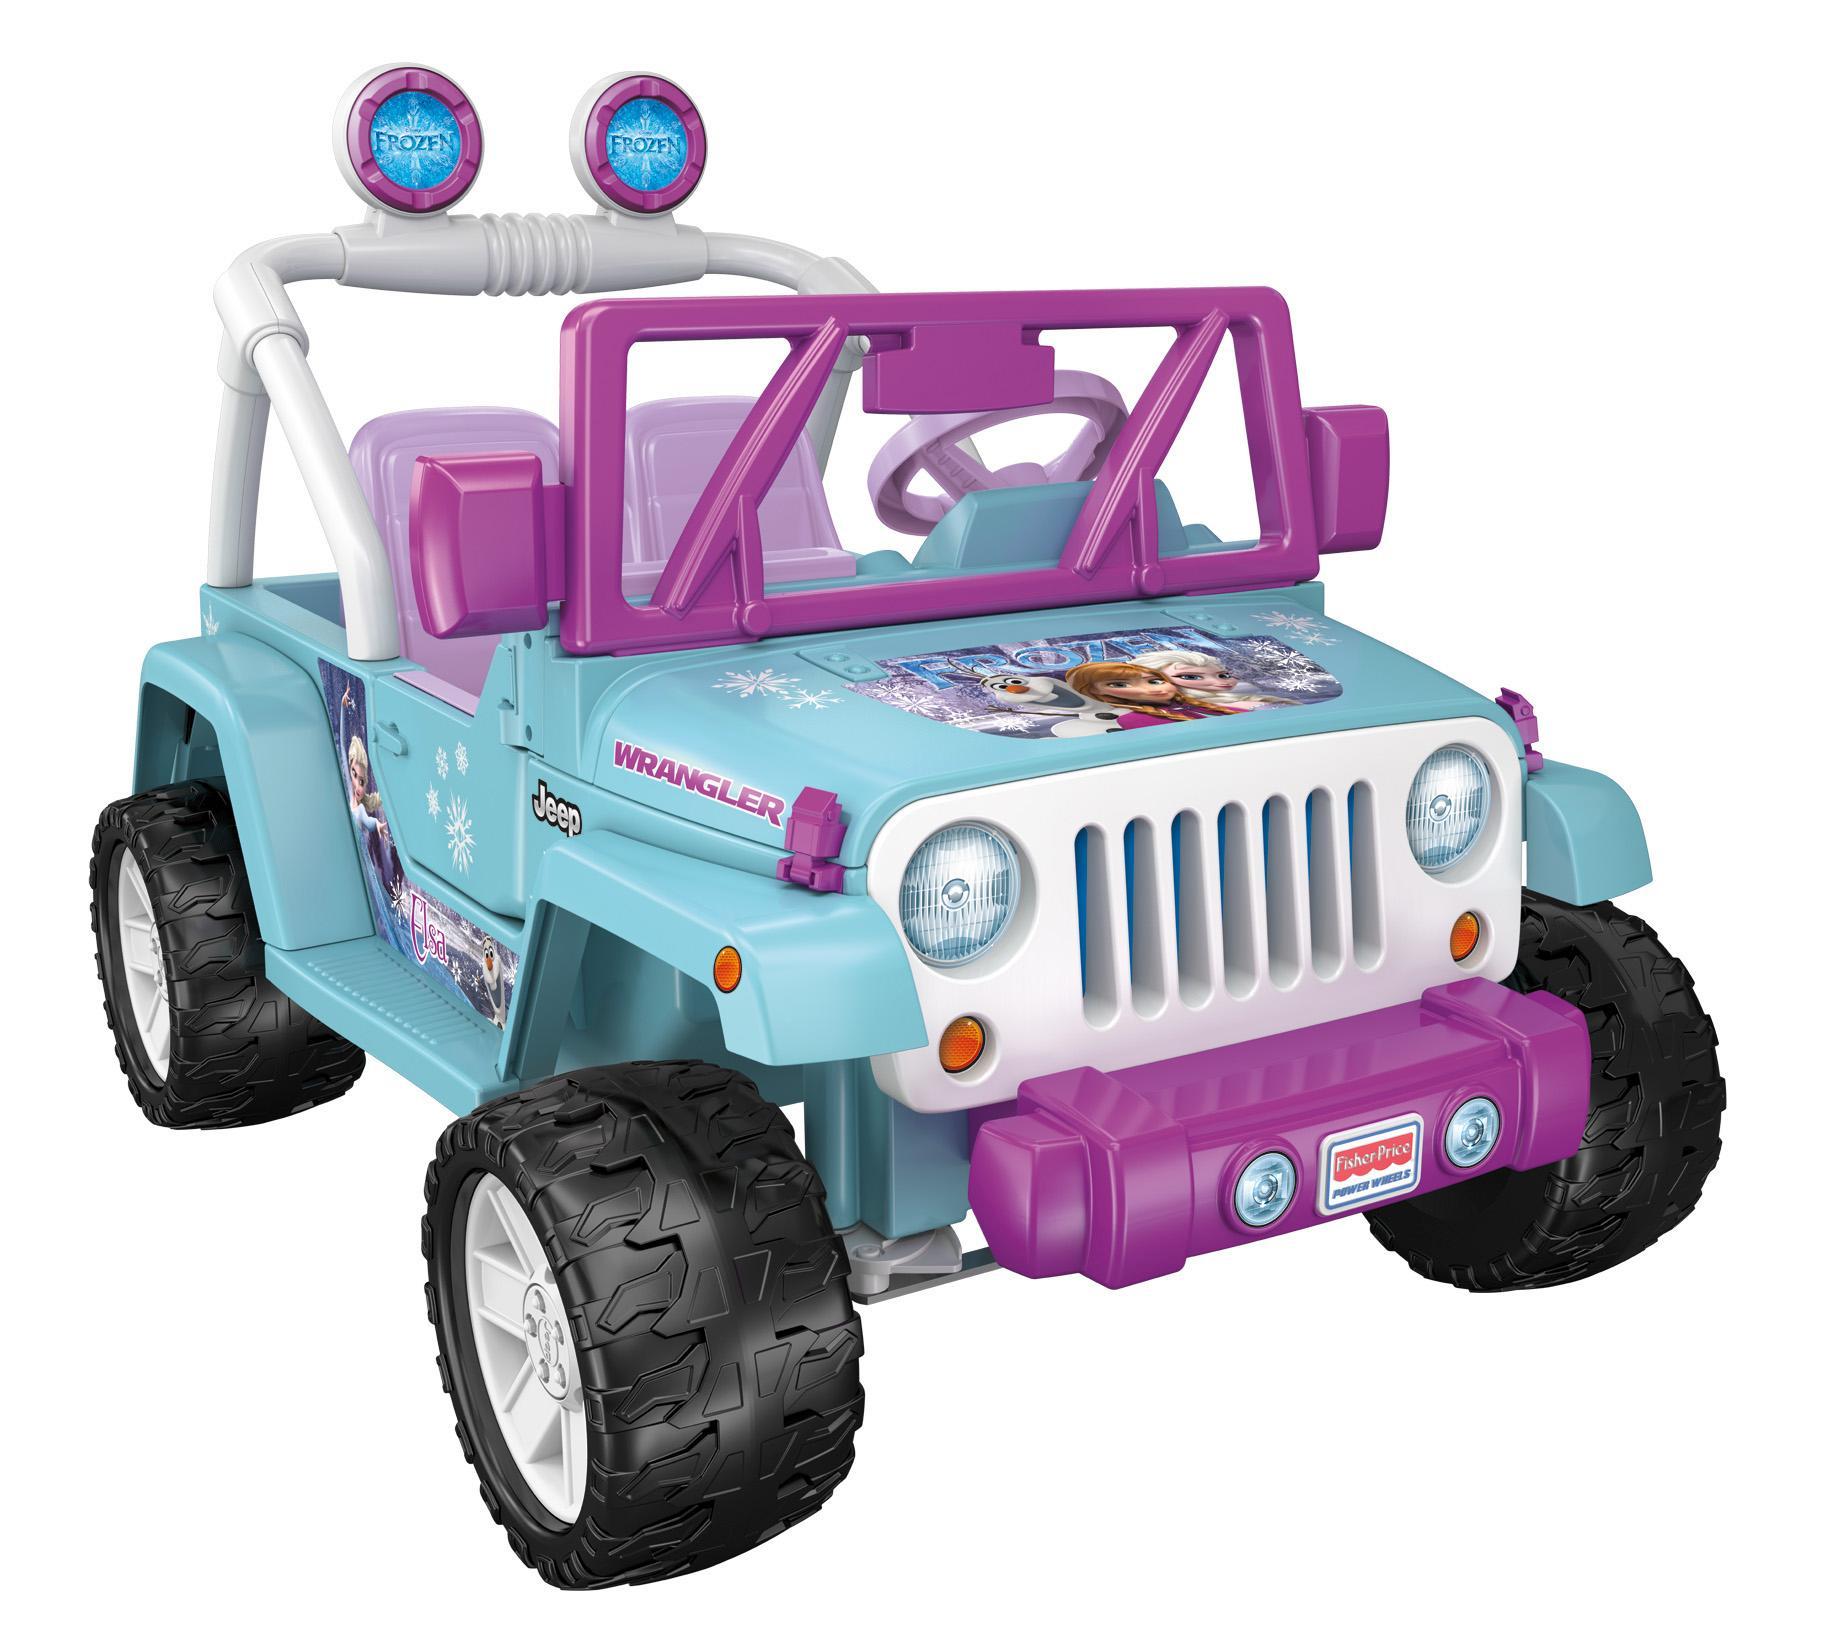 Amazon.com: Power Wheels Disney Frozen Jeep Wrangler, Baby